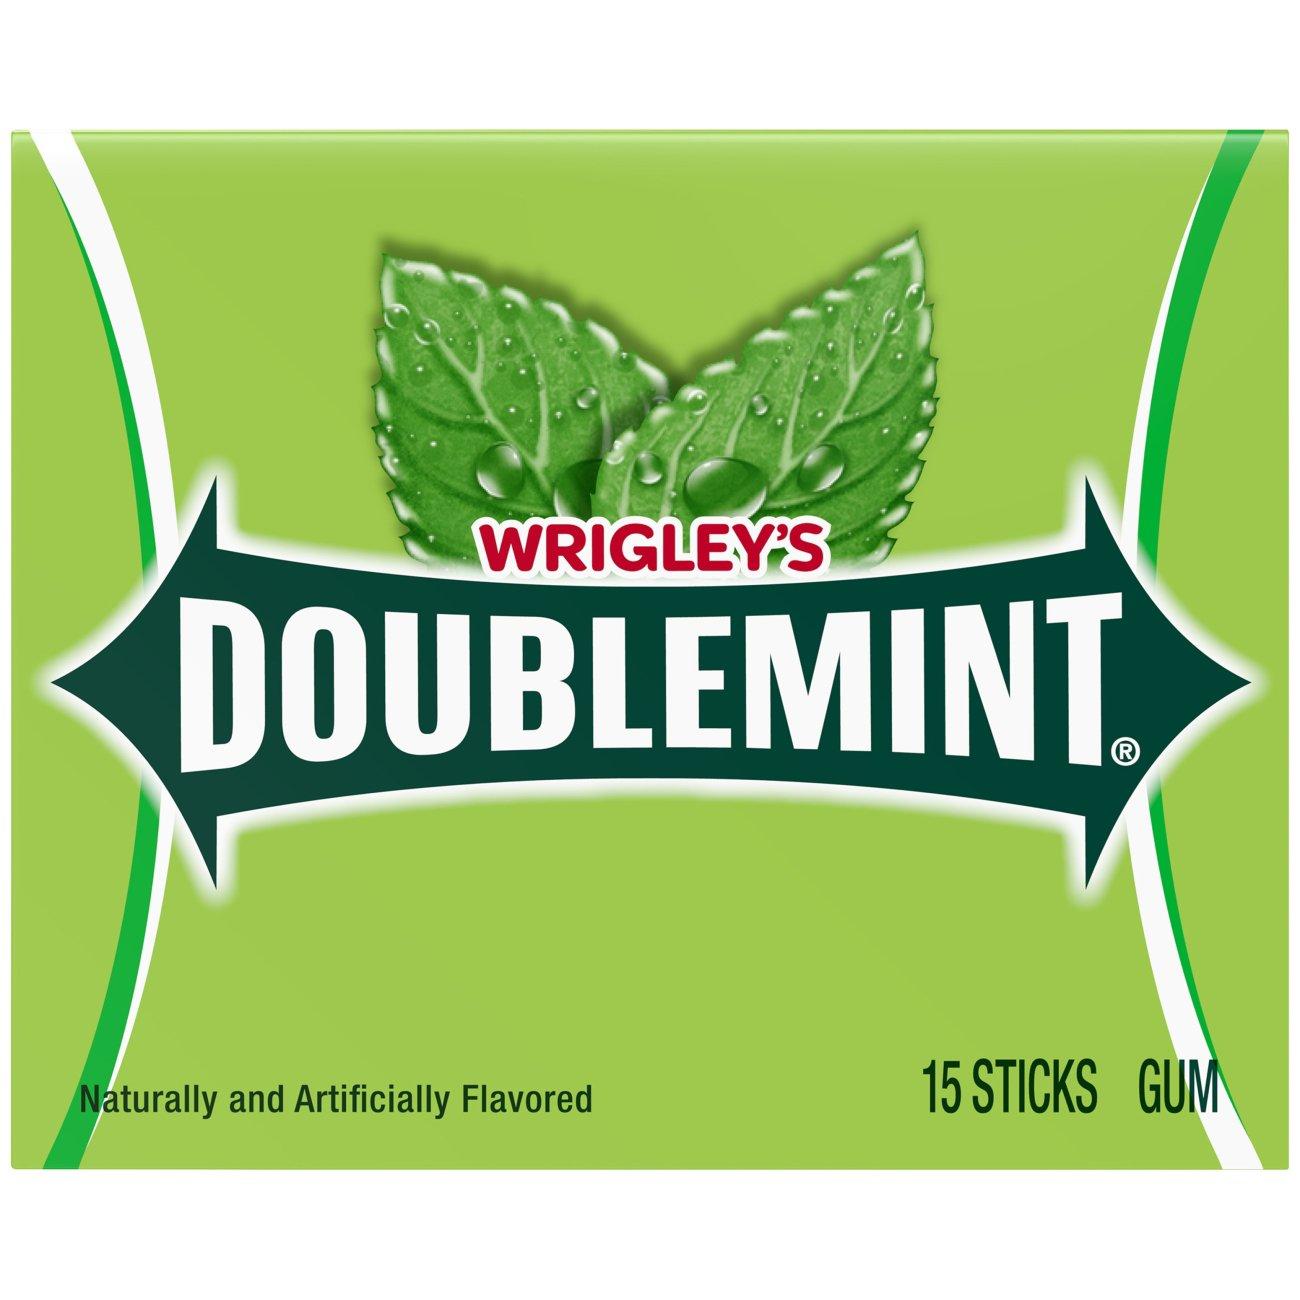 Wrigleys Chewing Gum.